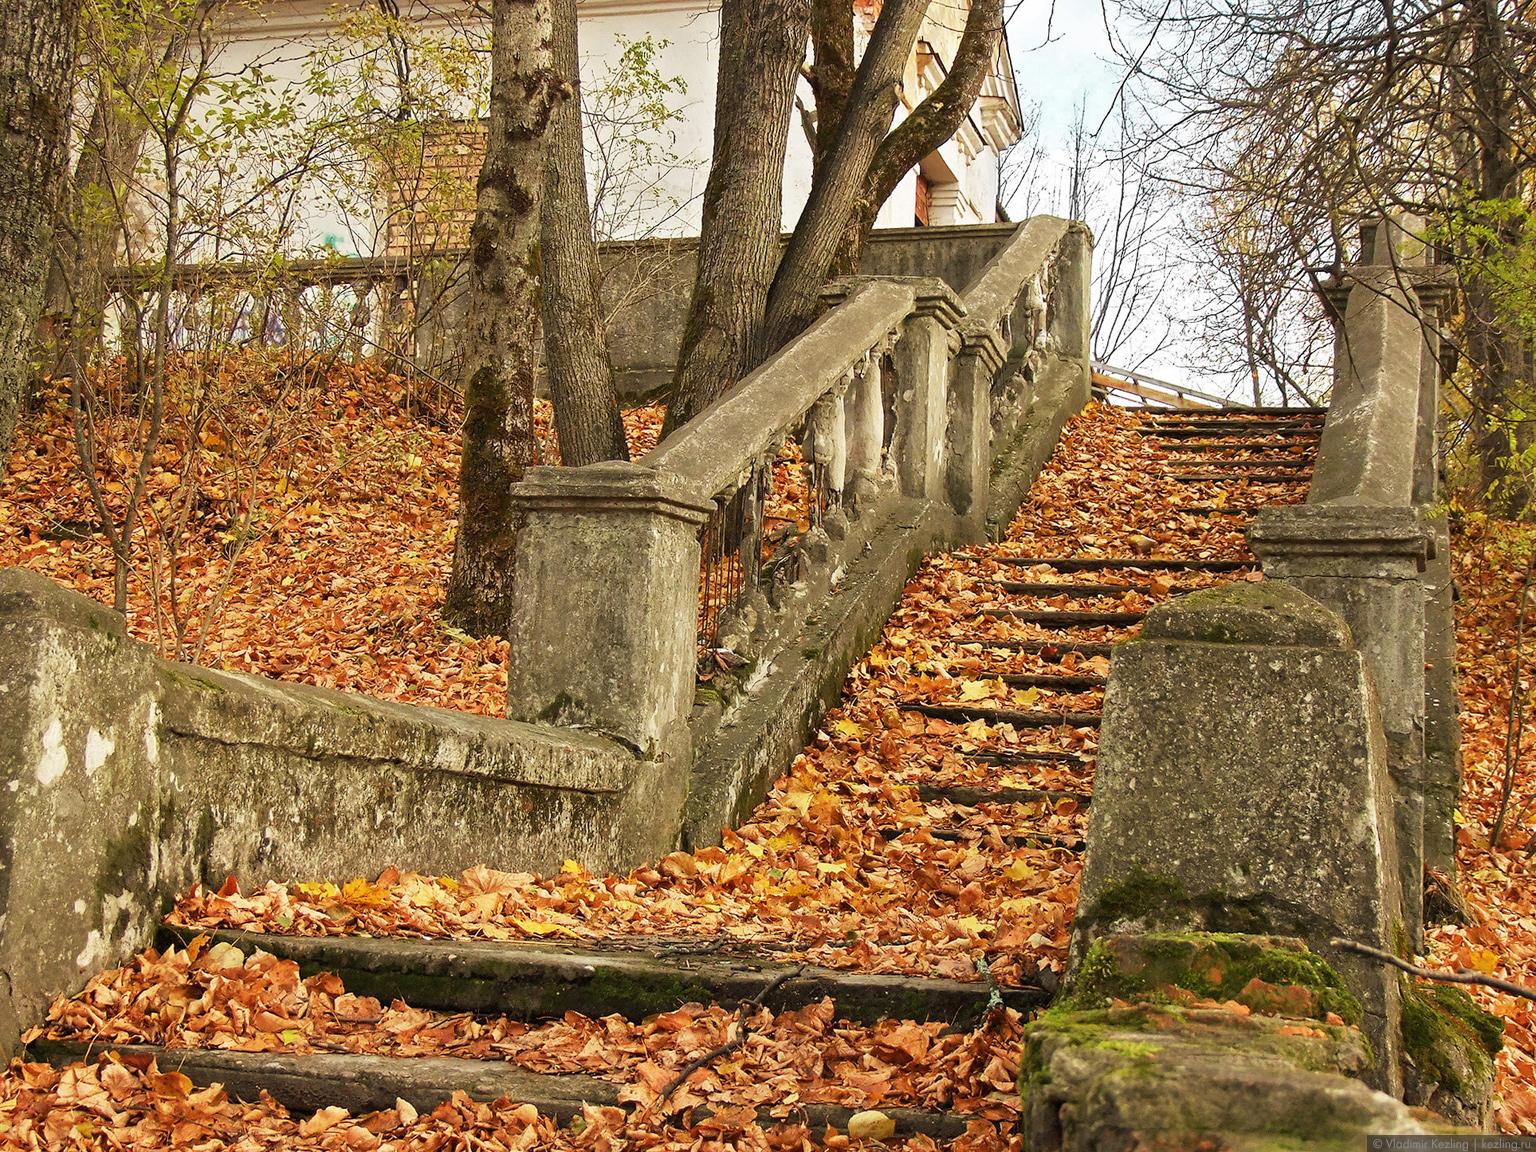 осень в пушкинских горах фото